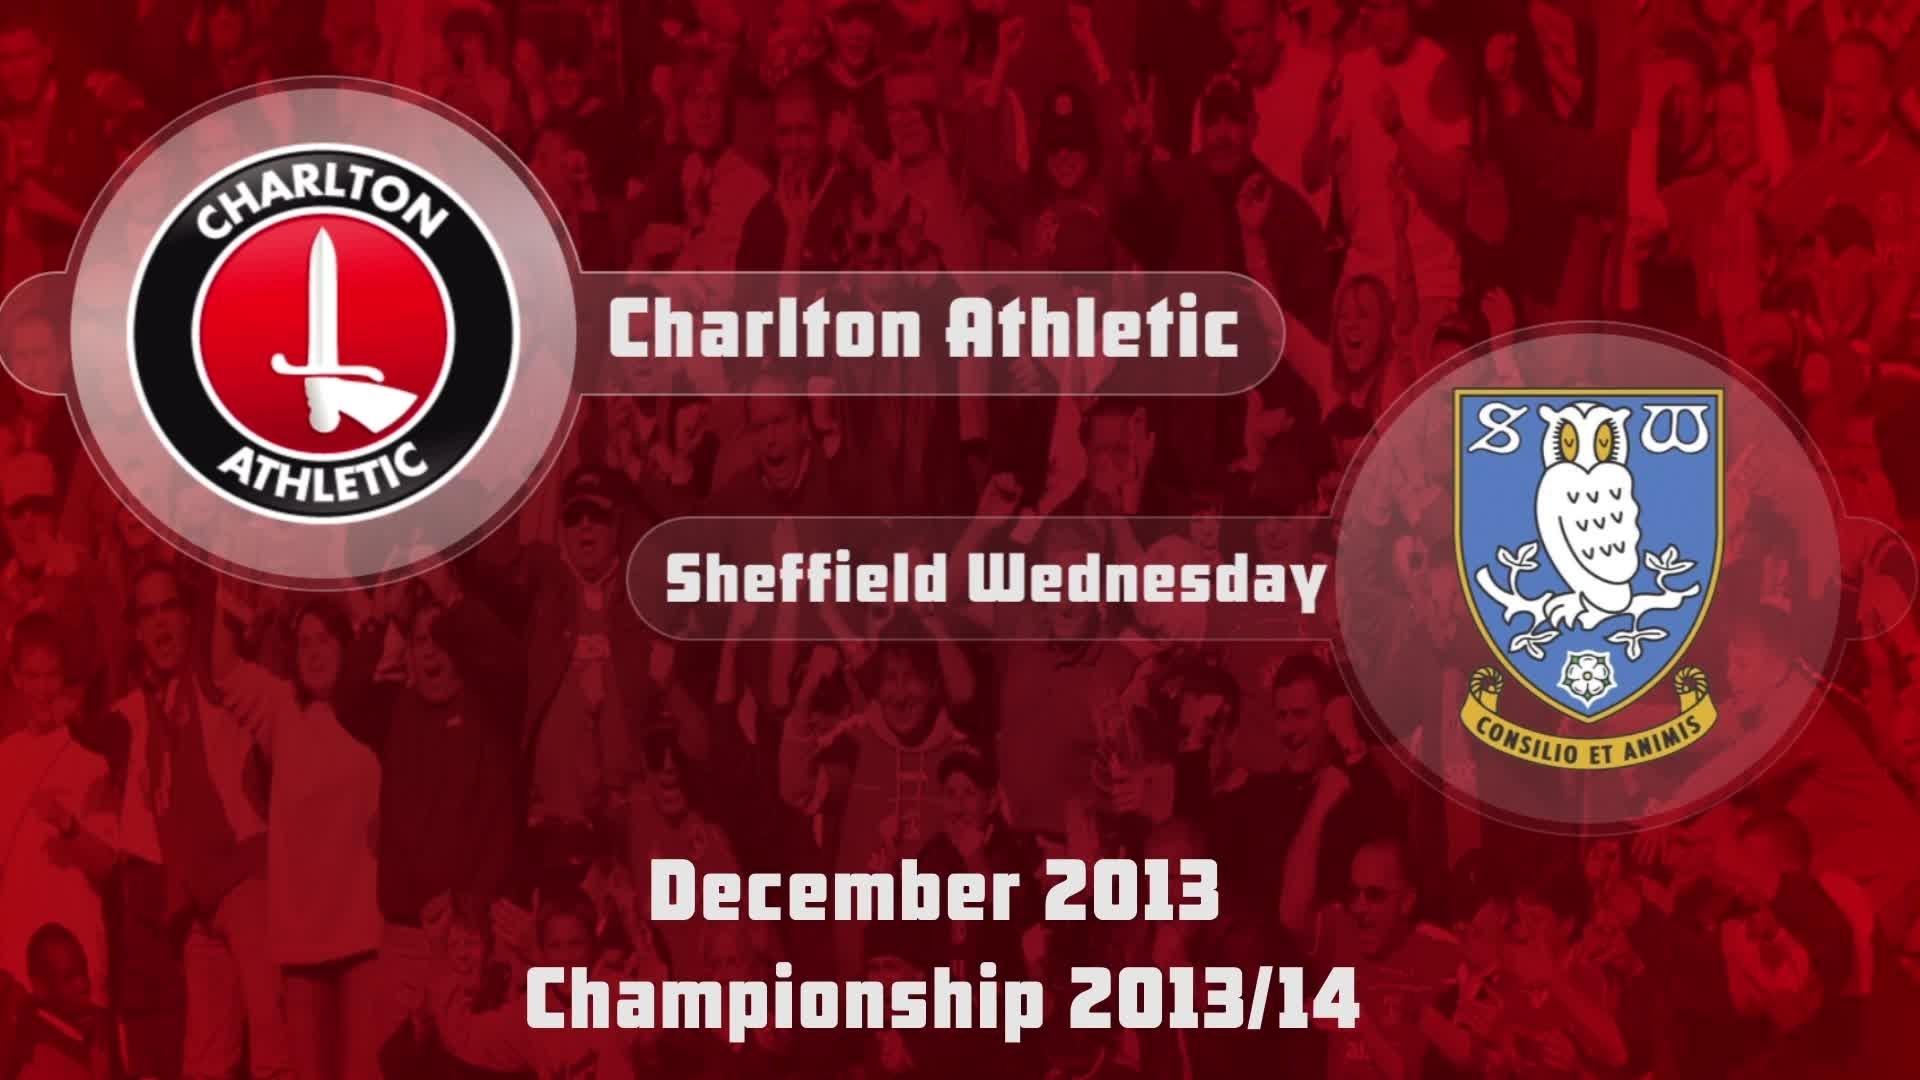 25 HIGHLIGHTS | Charlton 1 Sheffield Wednesday (Dec 2013)